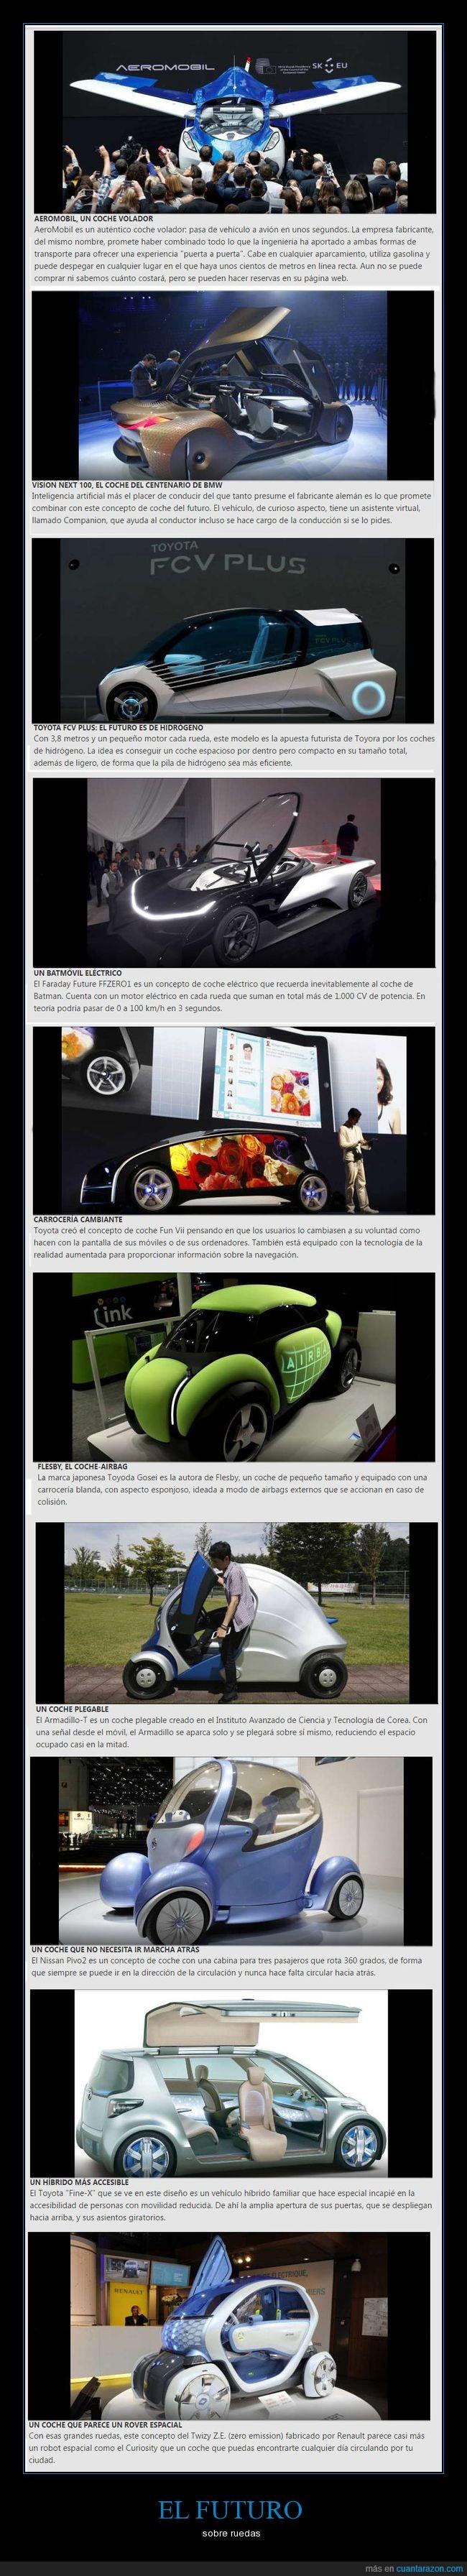 automoviles,autos voladores,futuro,ruedas